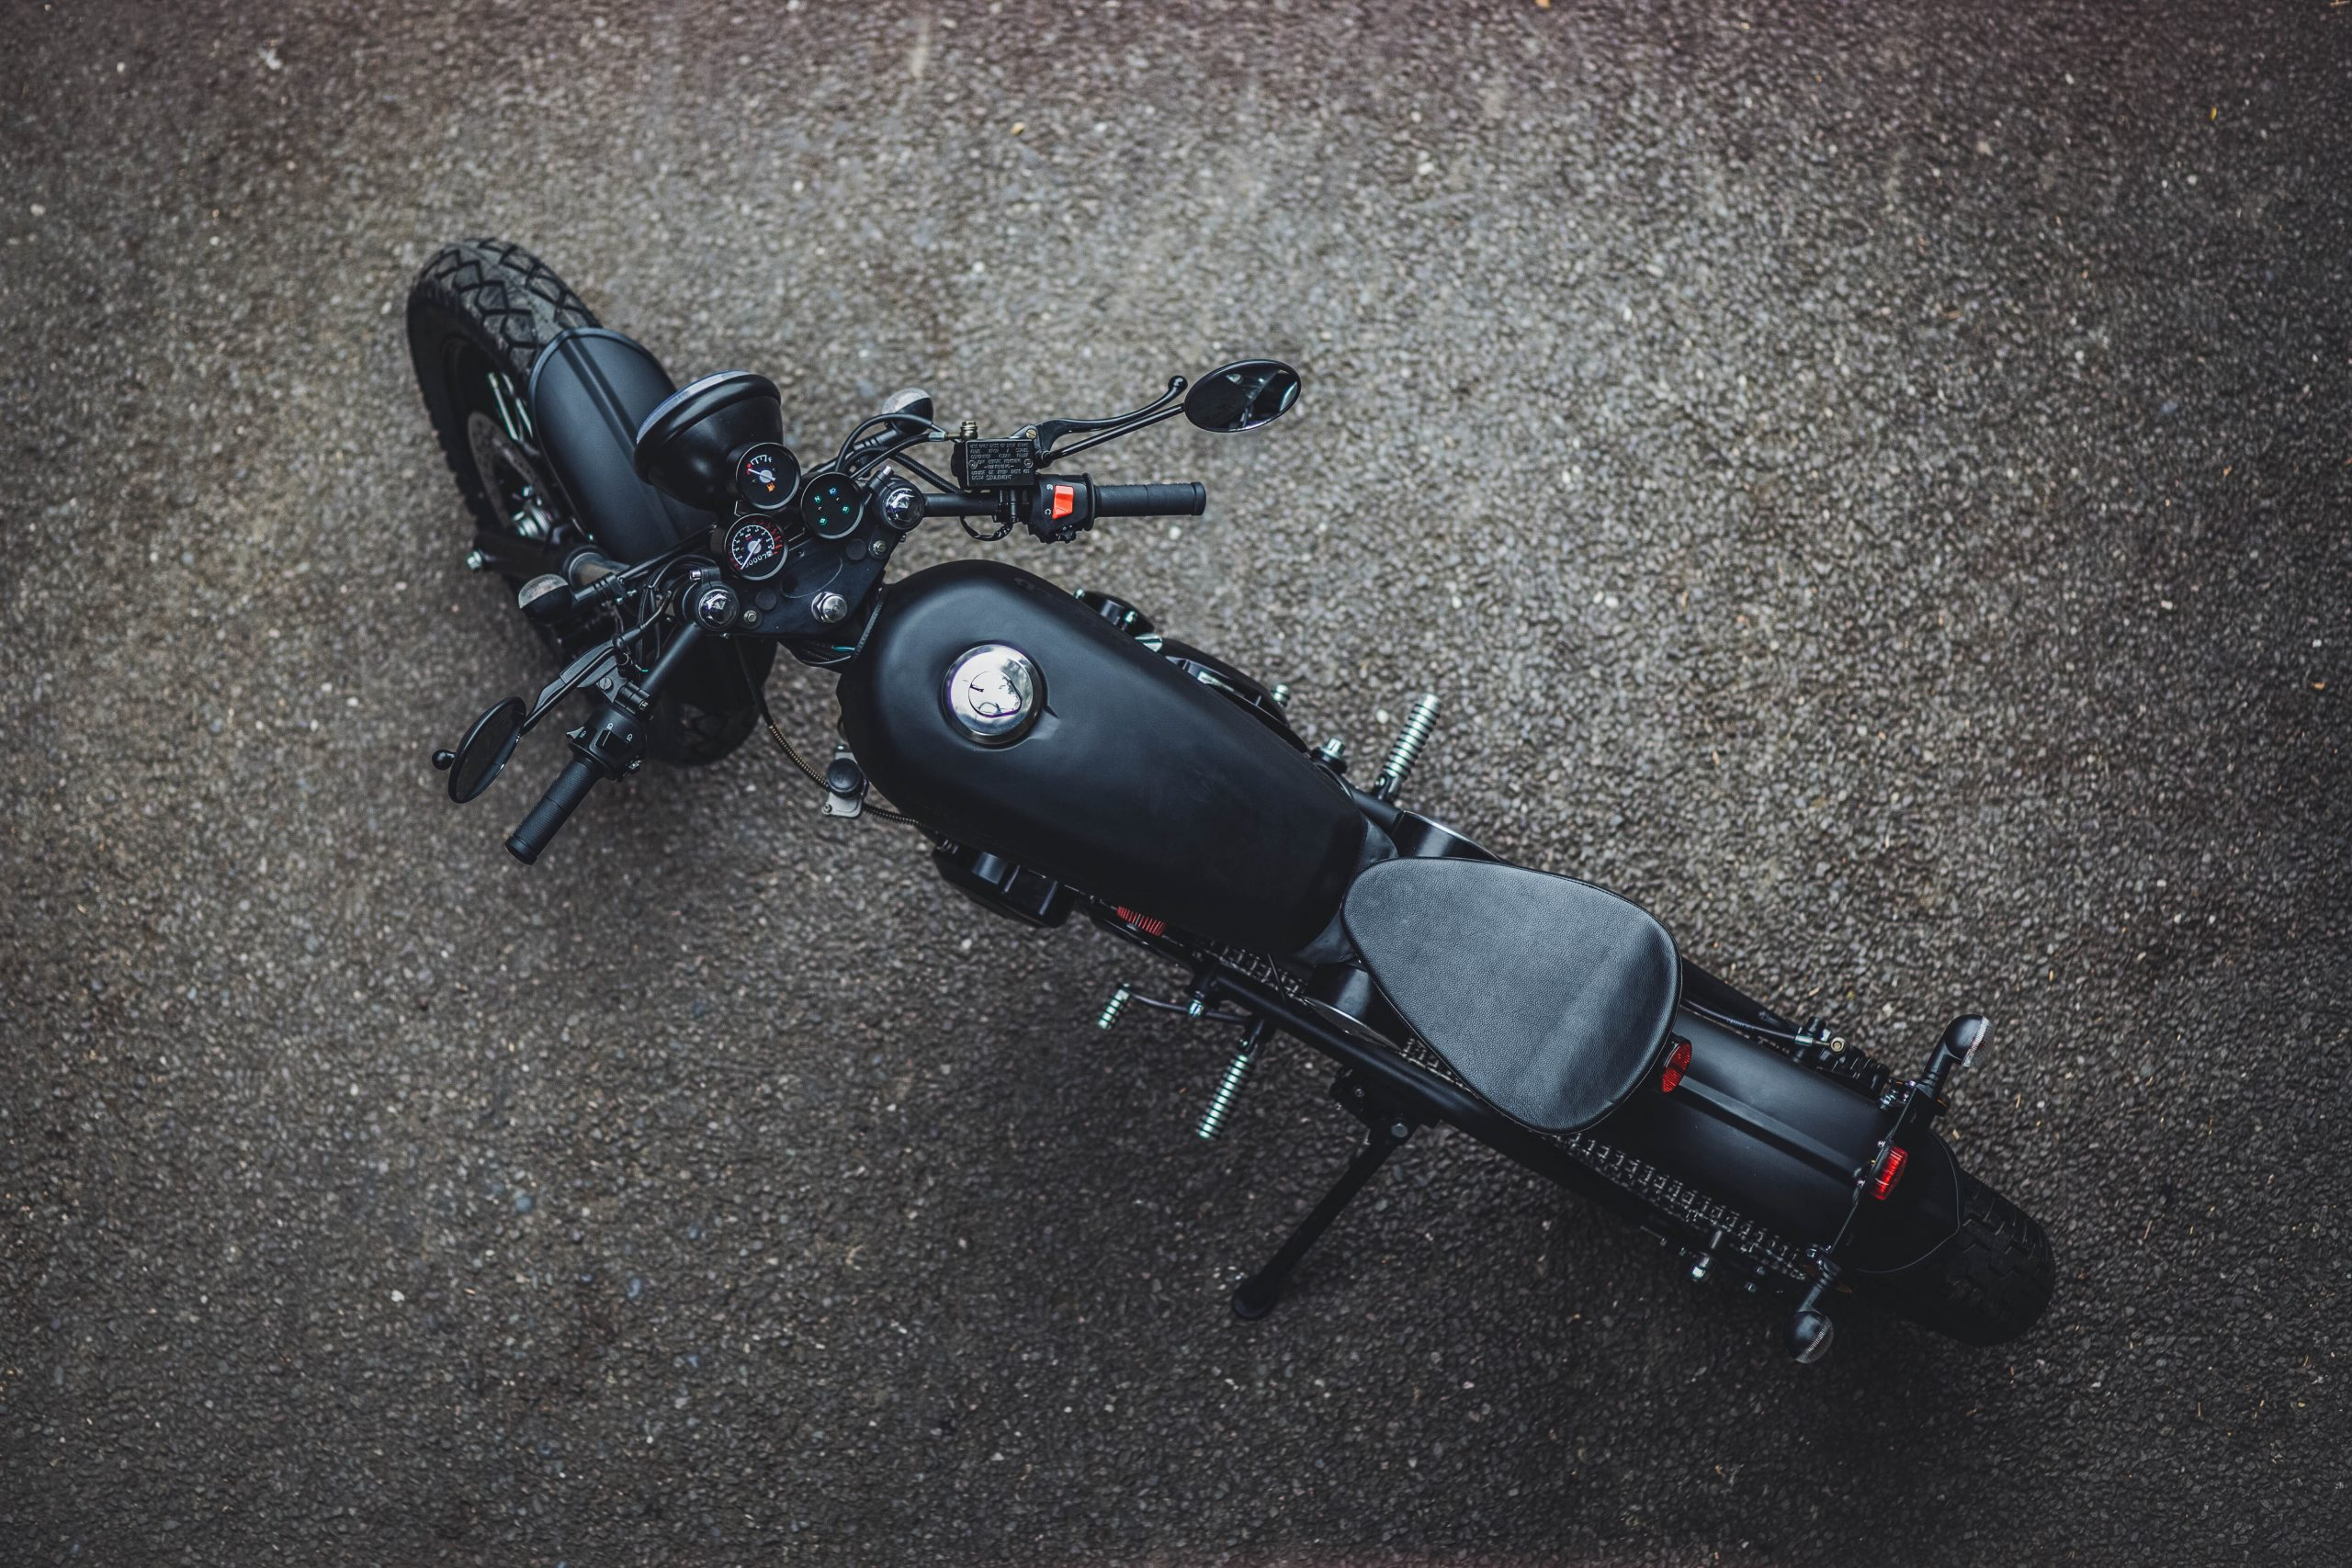 Birdseye view of motorbike